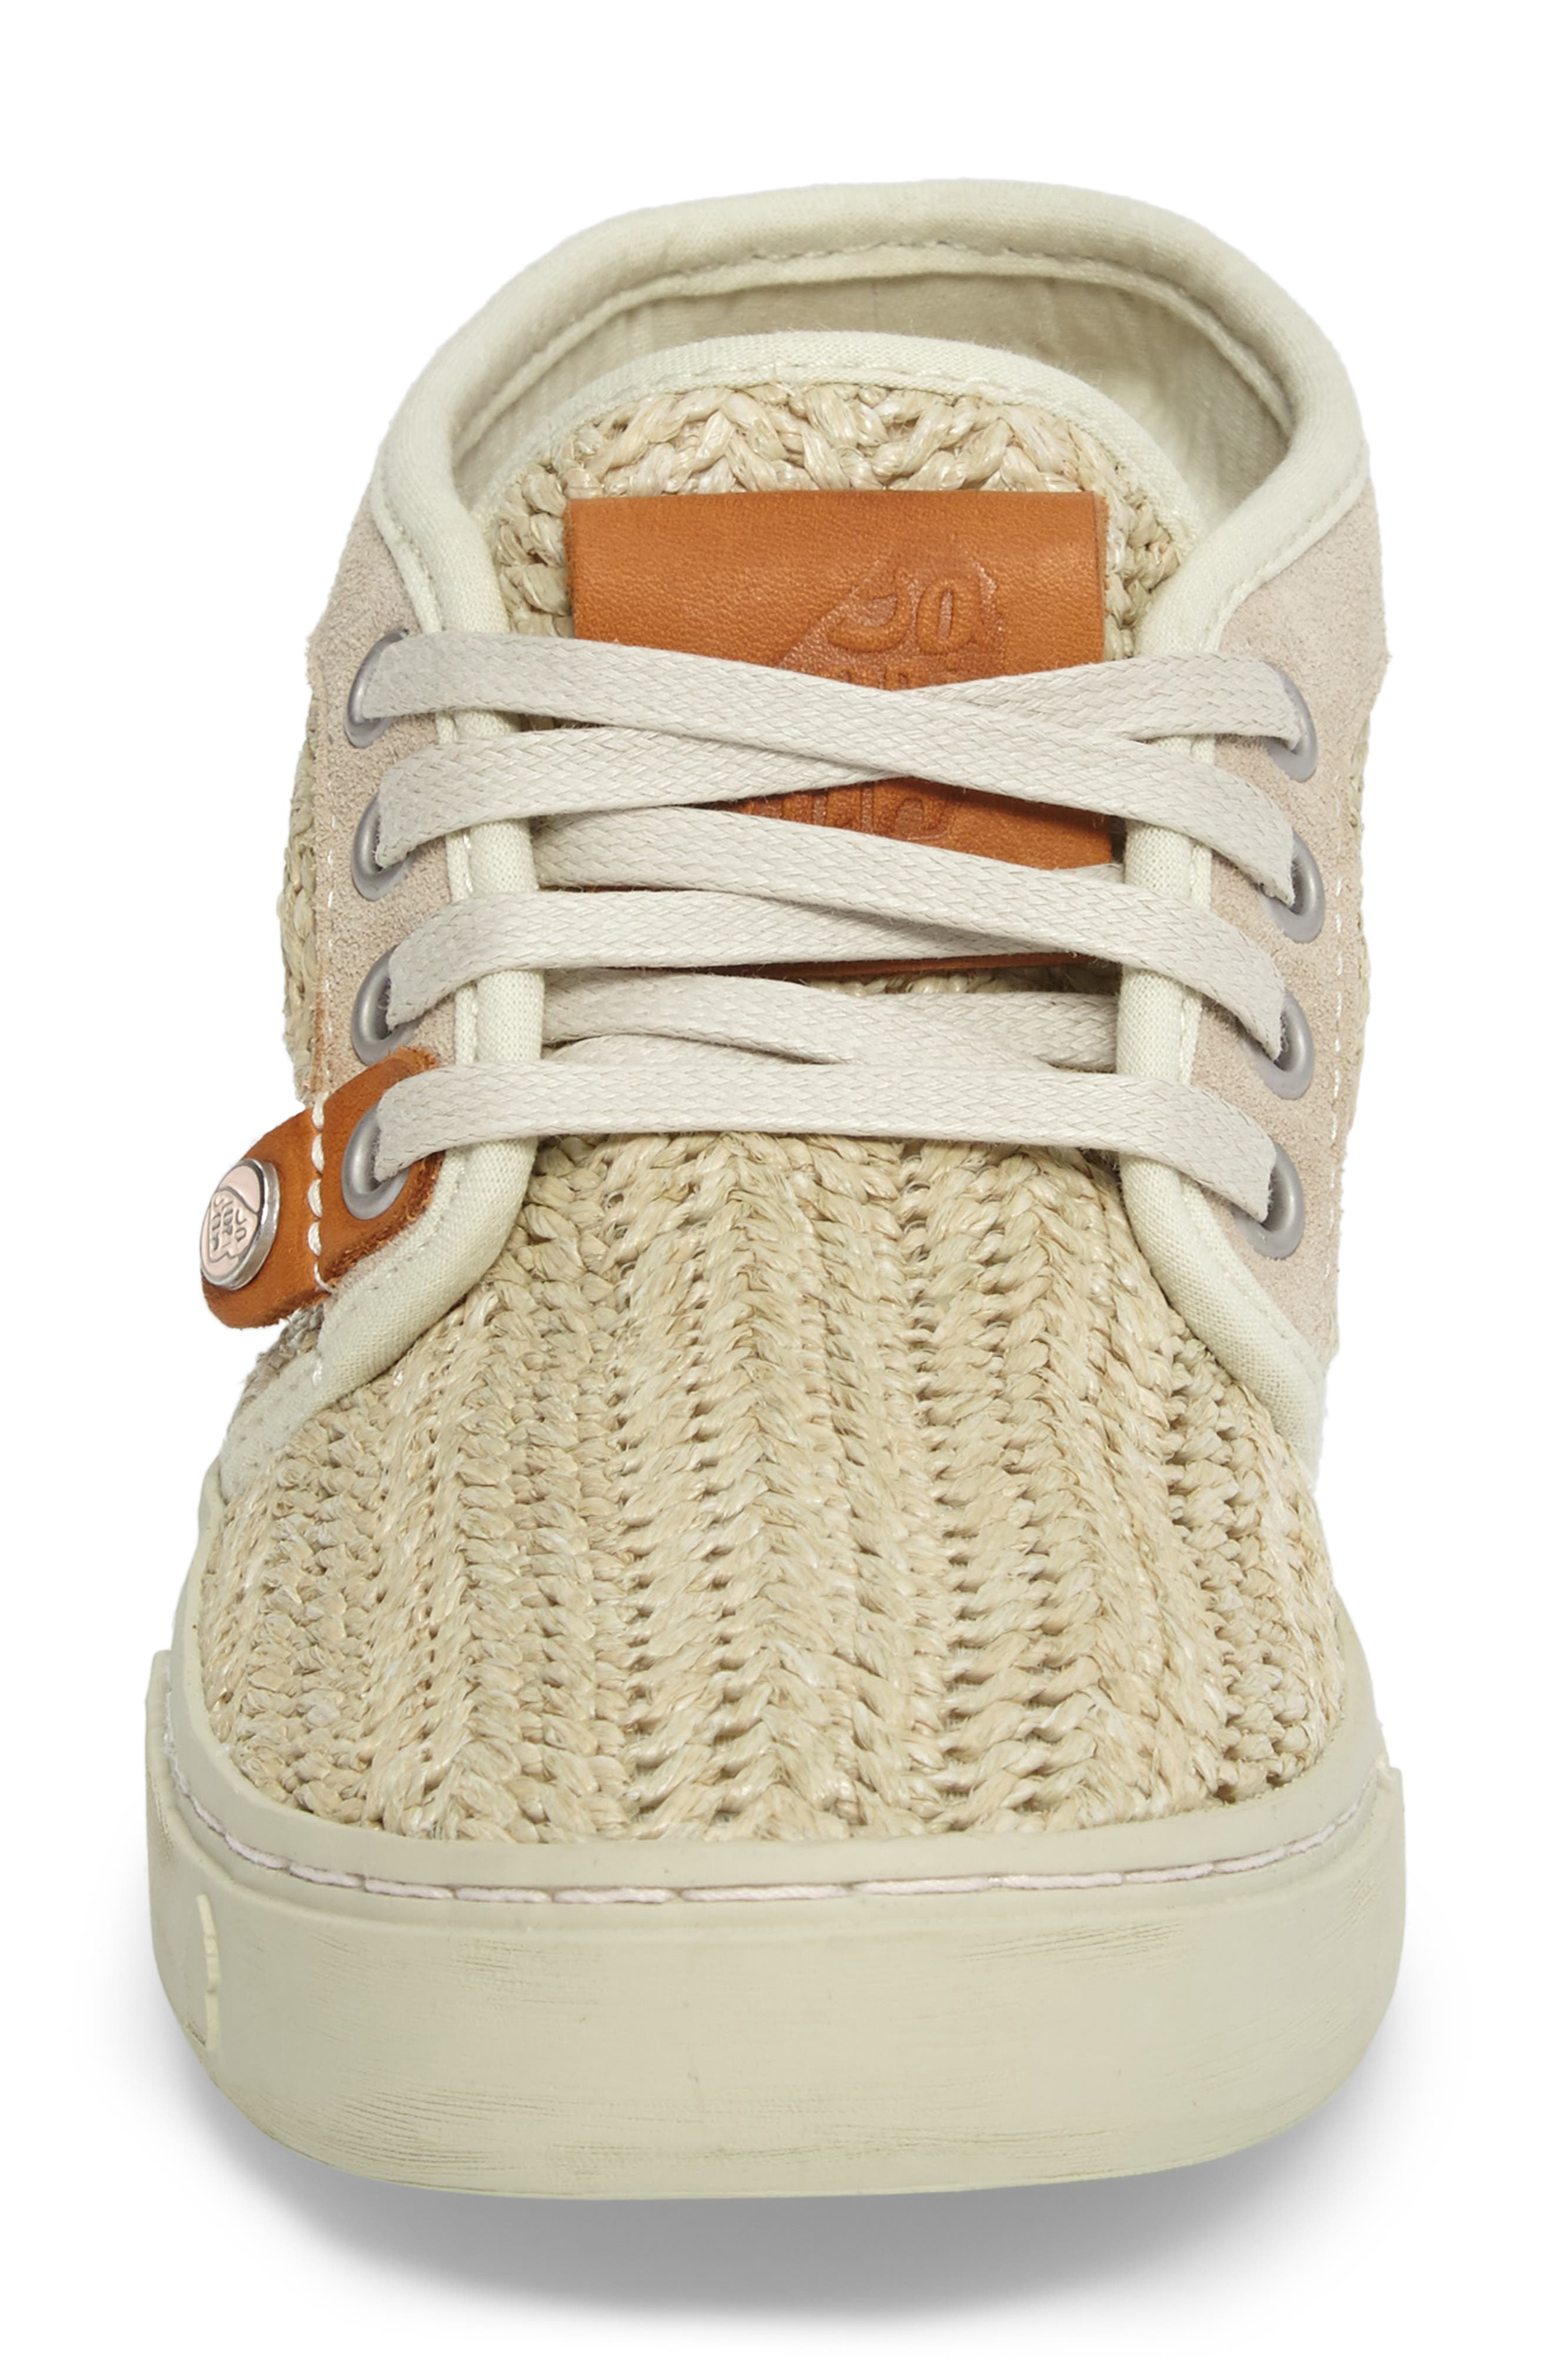 Hamoru Woven High Top Sneaker,                             Alternate thumbnail 4, color,                             YESO FABRIC